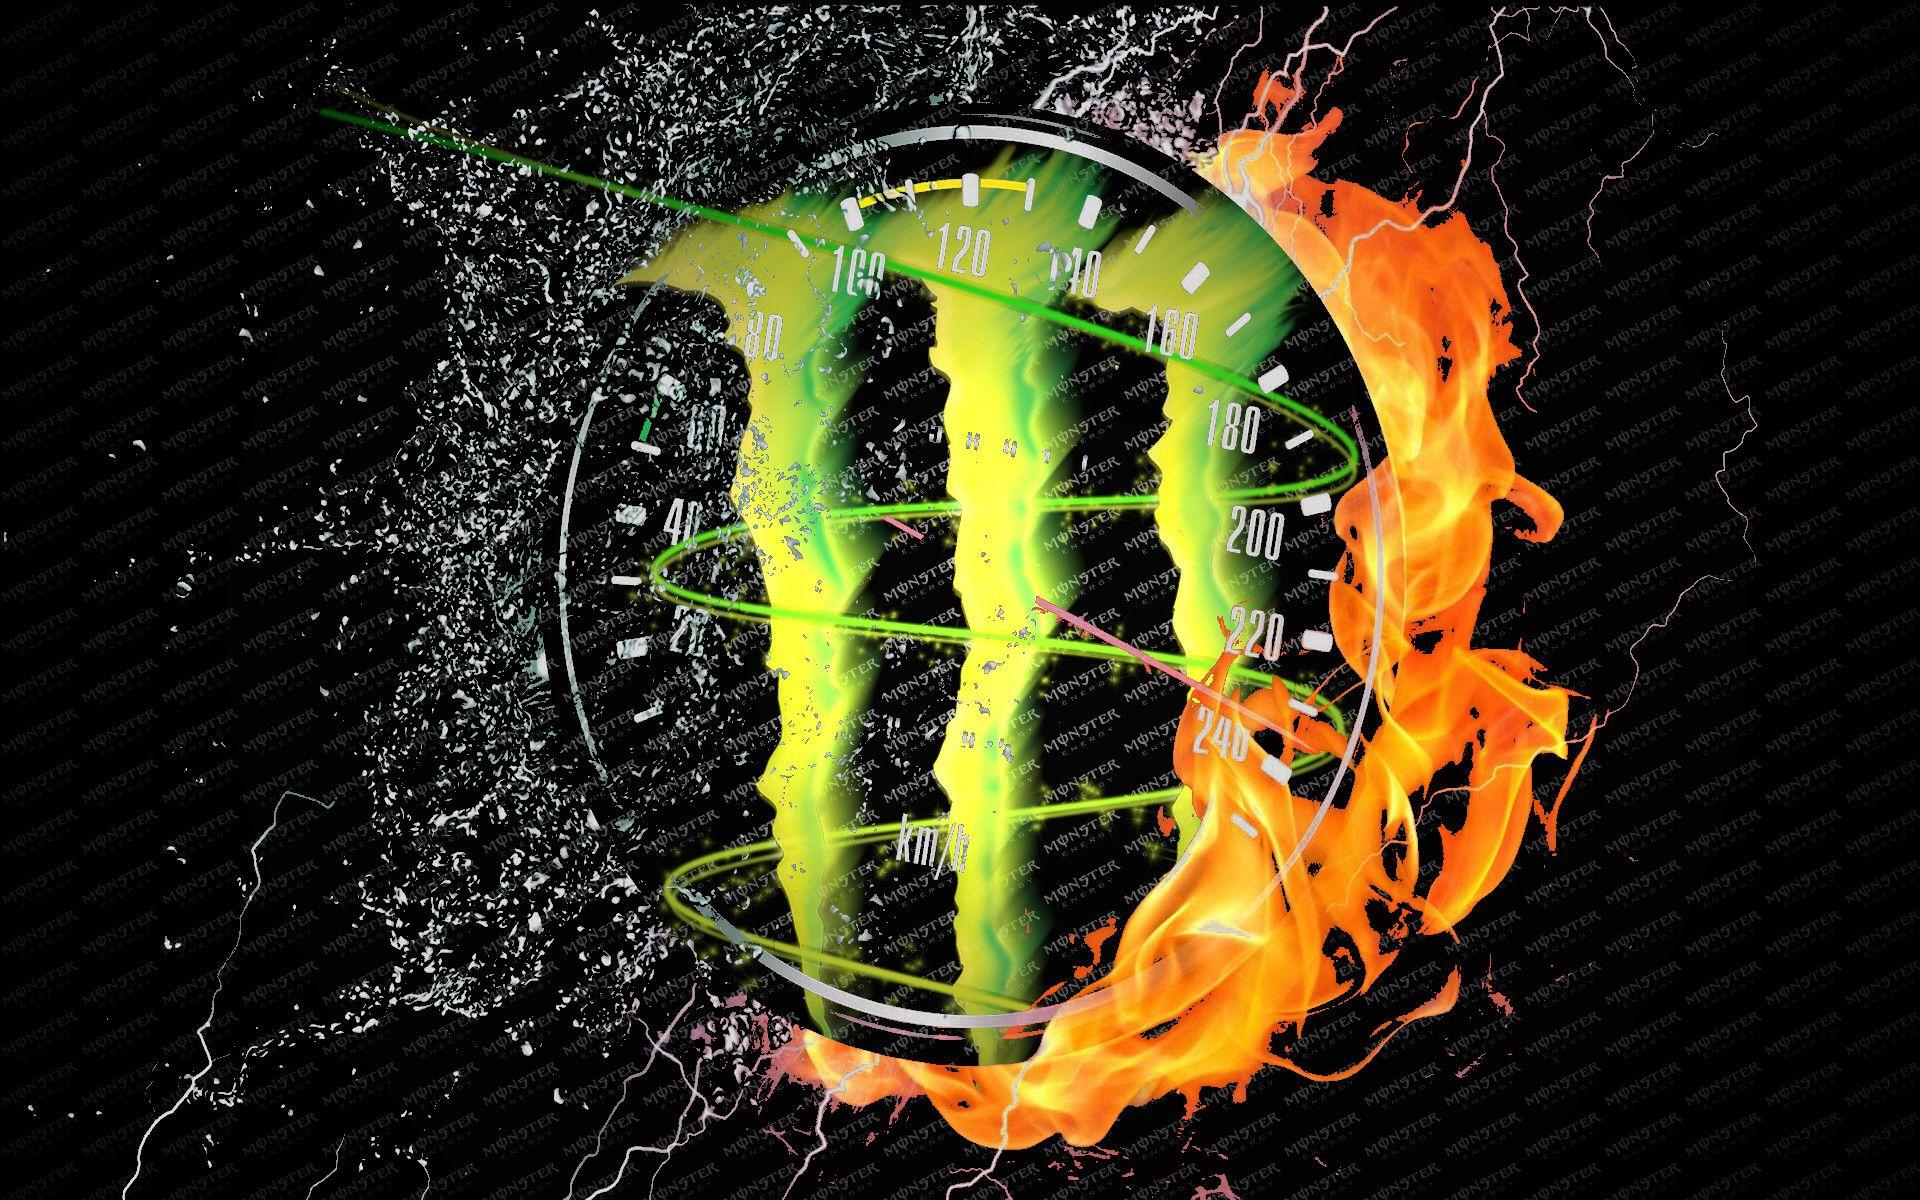 1920x1200 Monster Energy Logo Wallpaper Hd 3svqj57d Yoanu